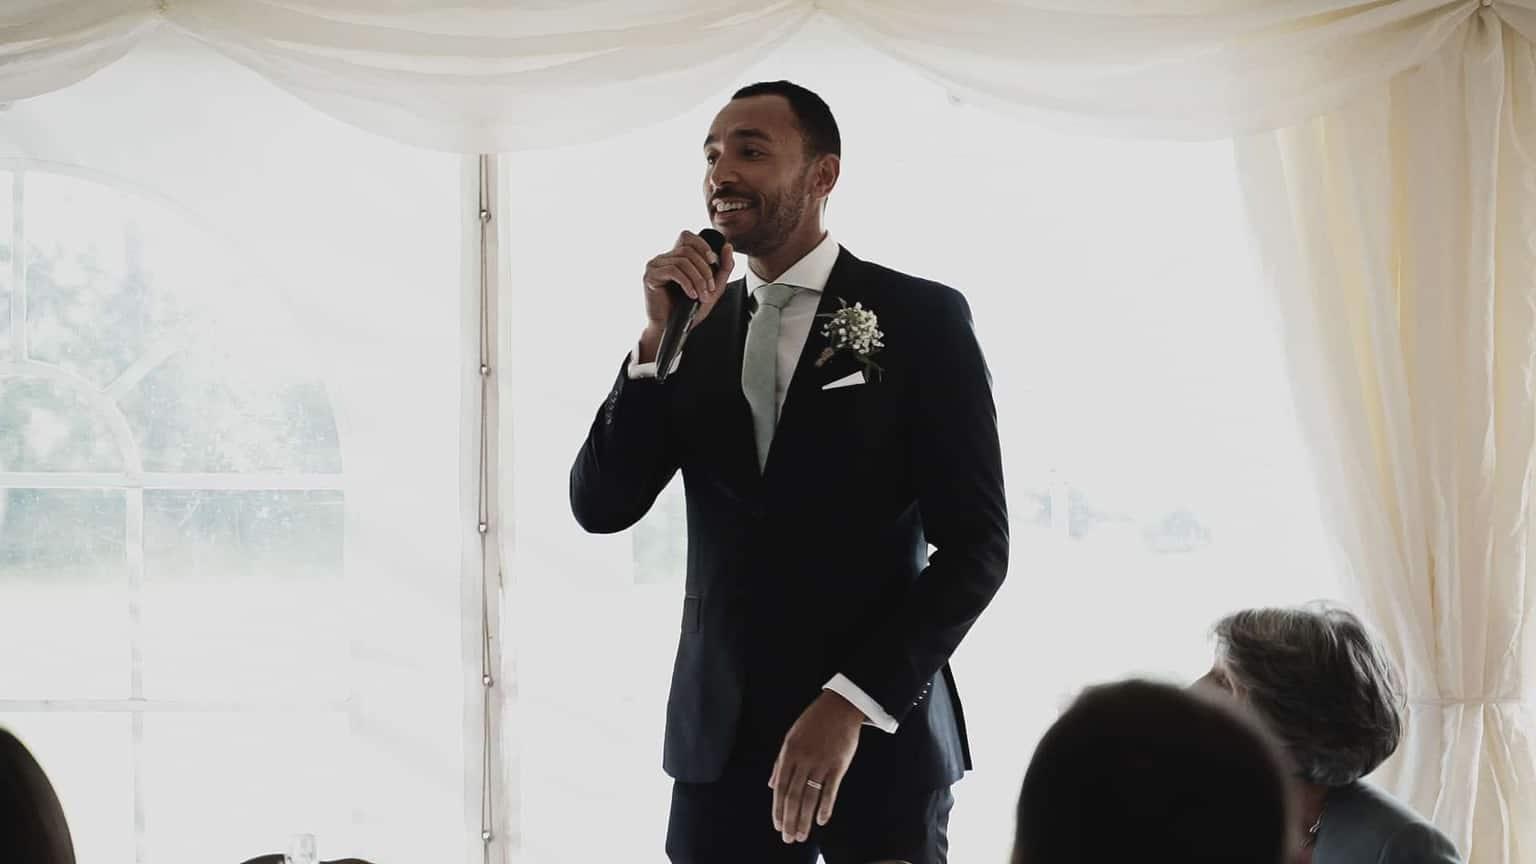 Grooms man introducing bride and groom